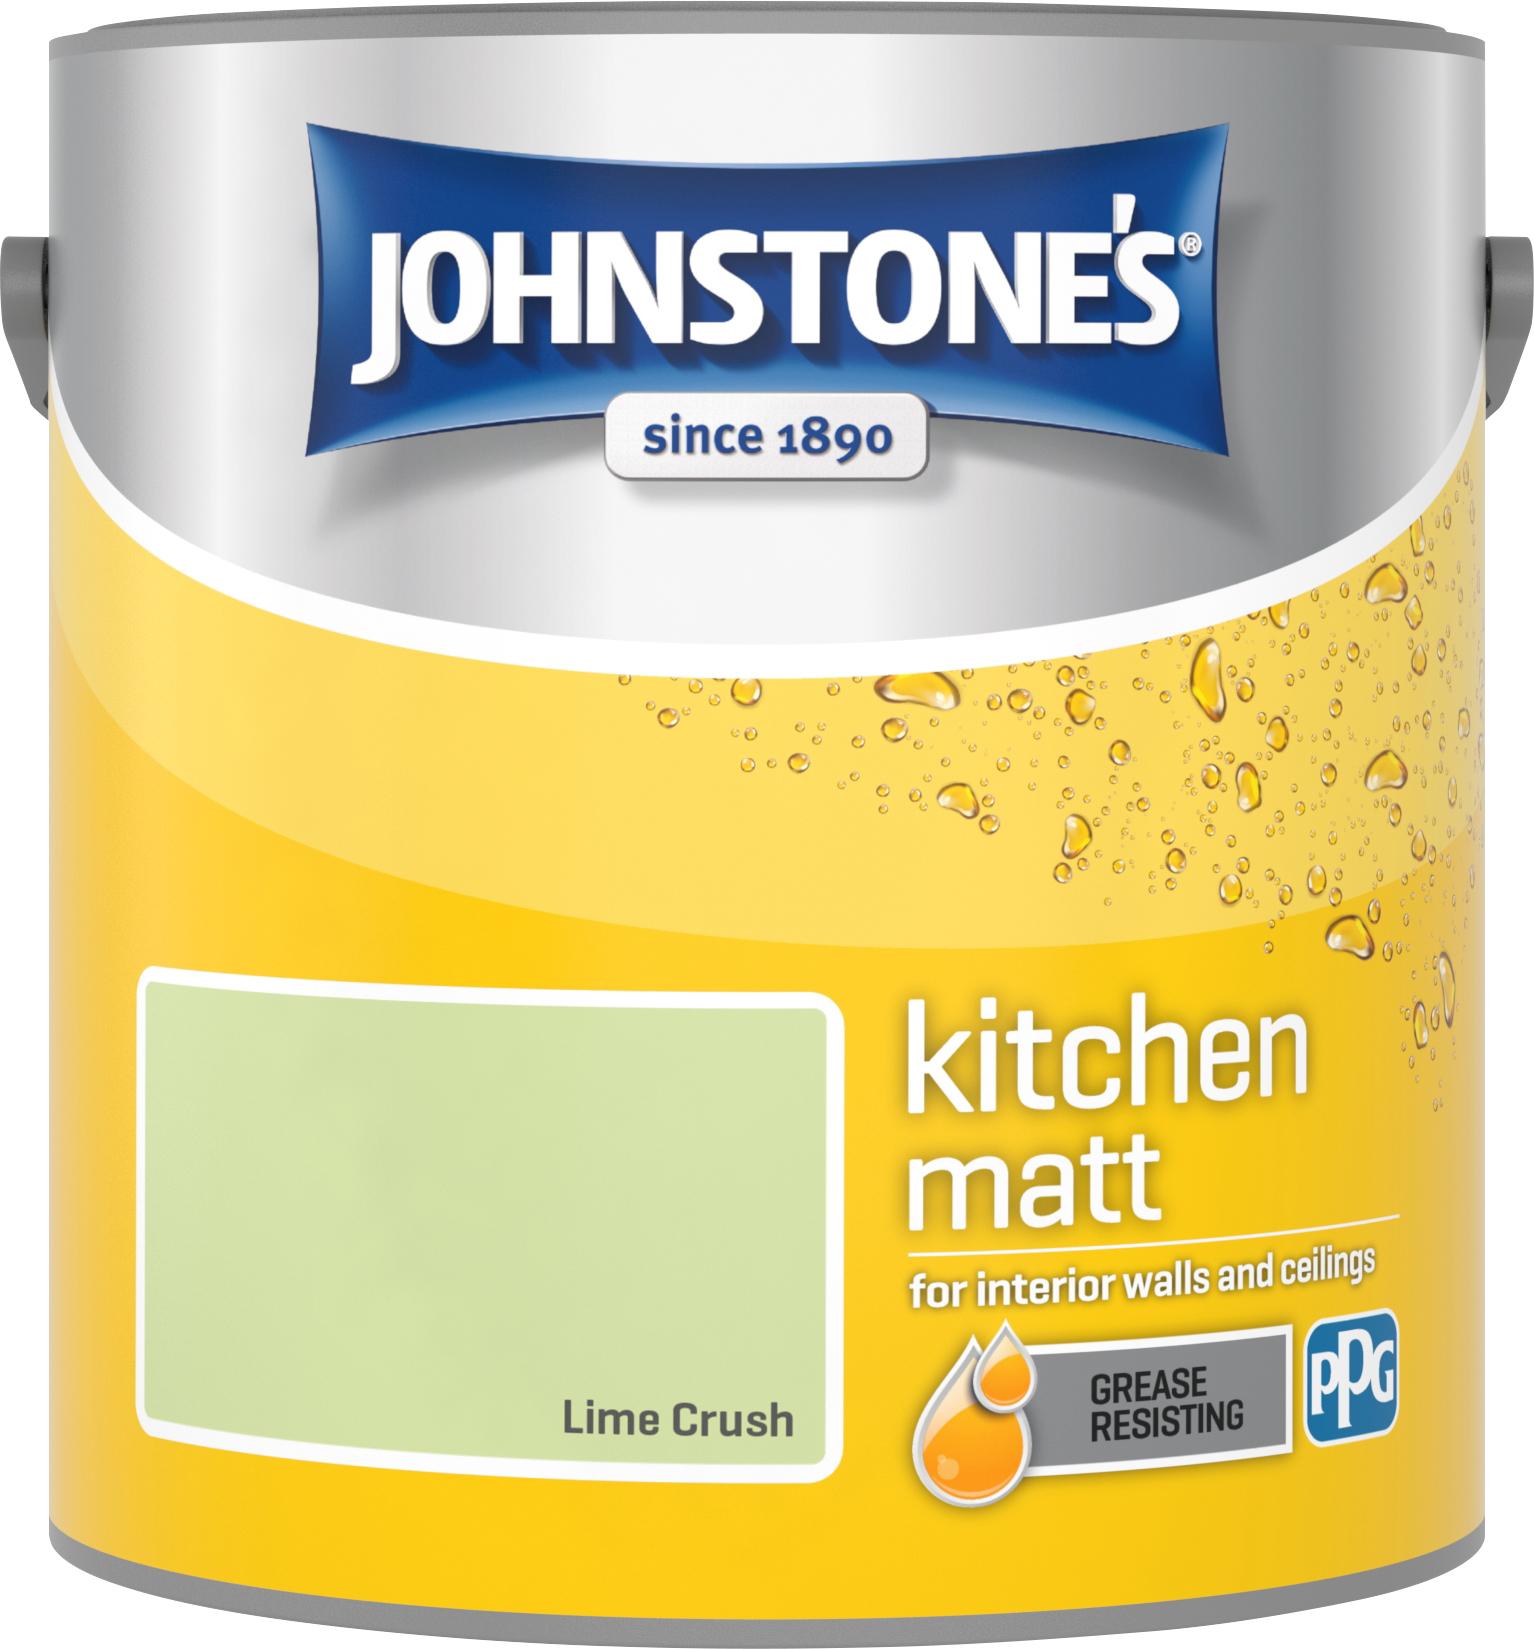 Johnstone's 2.5 Litre Kitchen Paint - Lime Crush